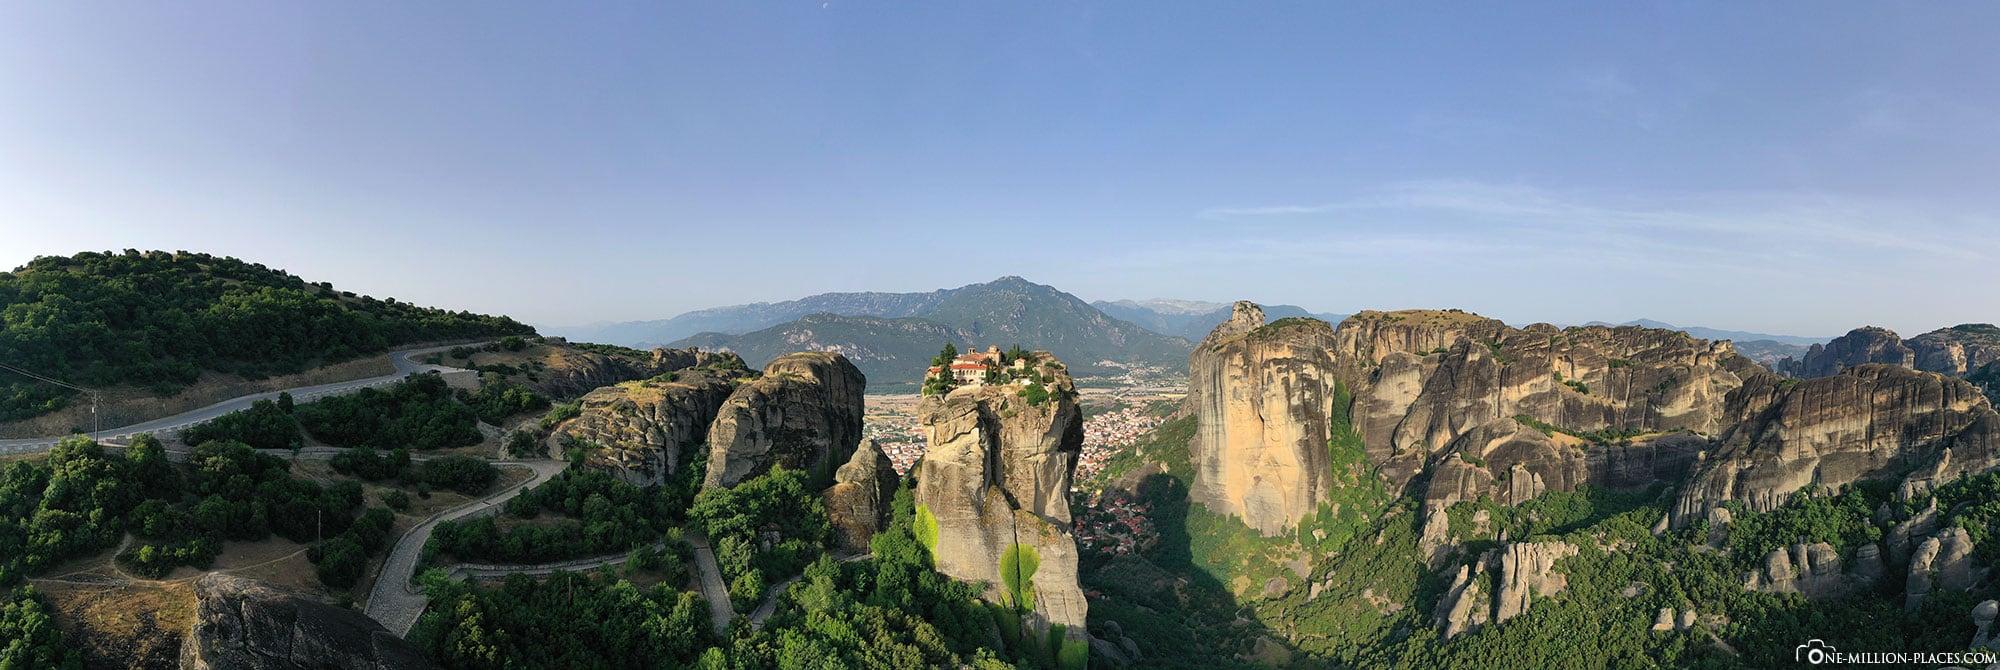 Panoramabild, Kloster Holy Trinity, Meteora, James Bond, Kloster auf Felsen, Griechenland, Reisebericht